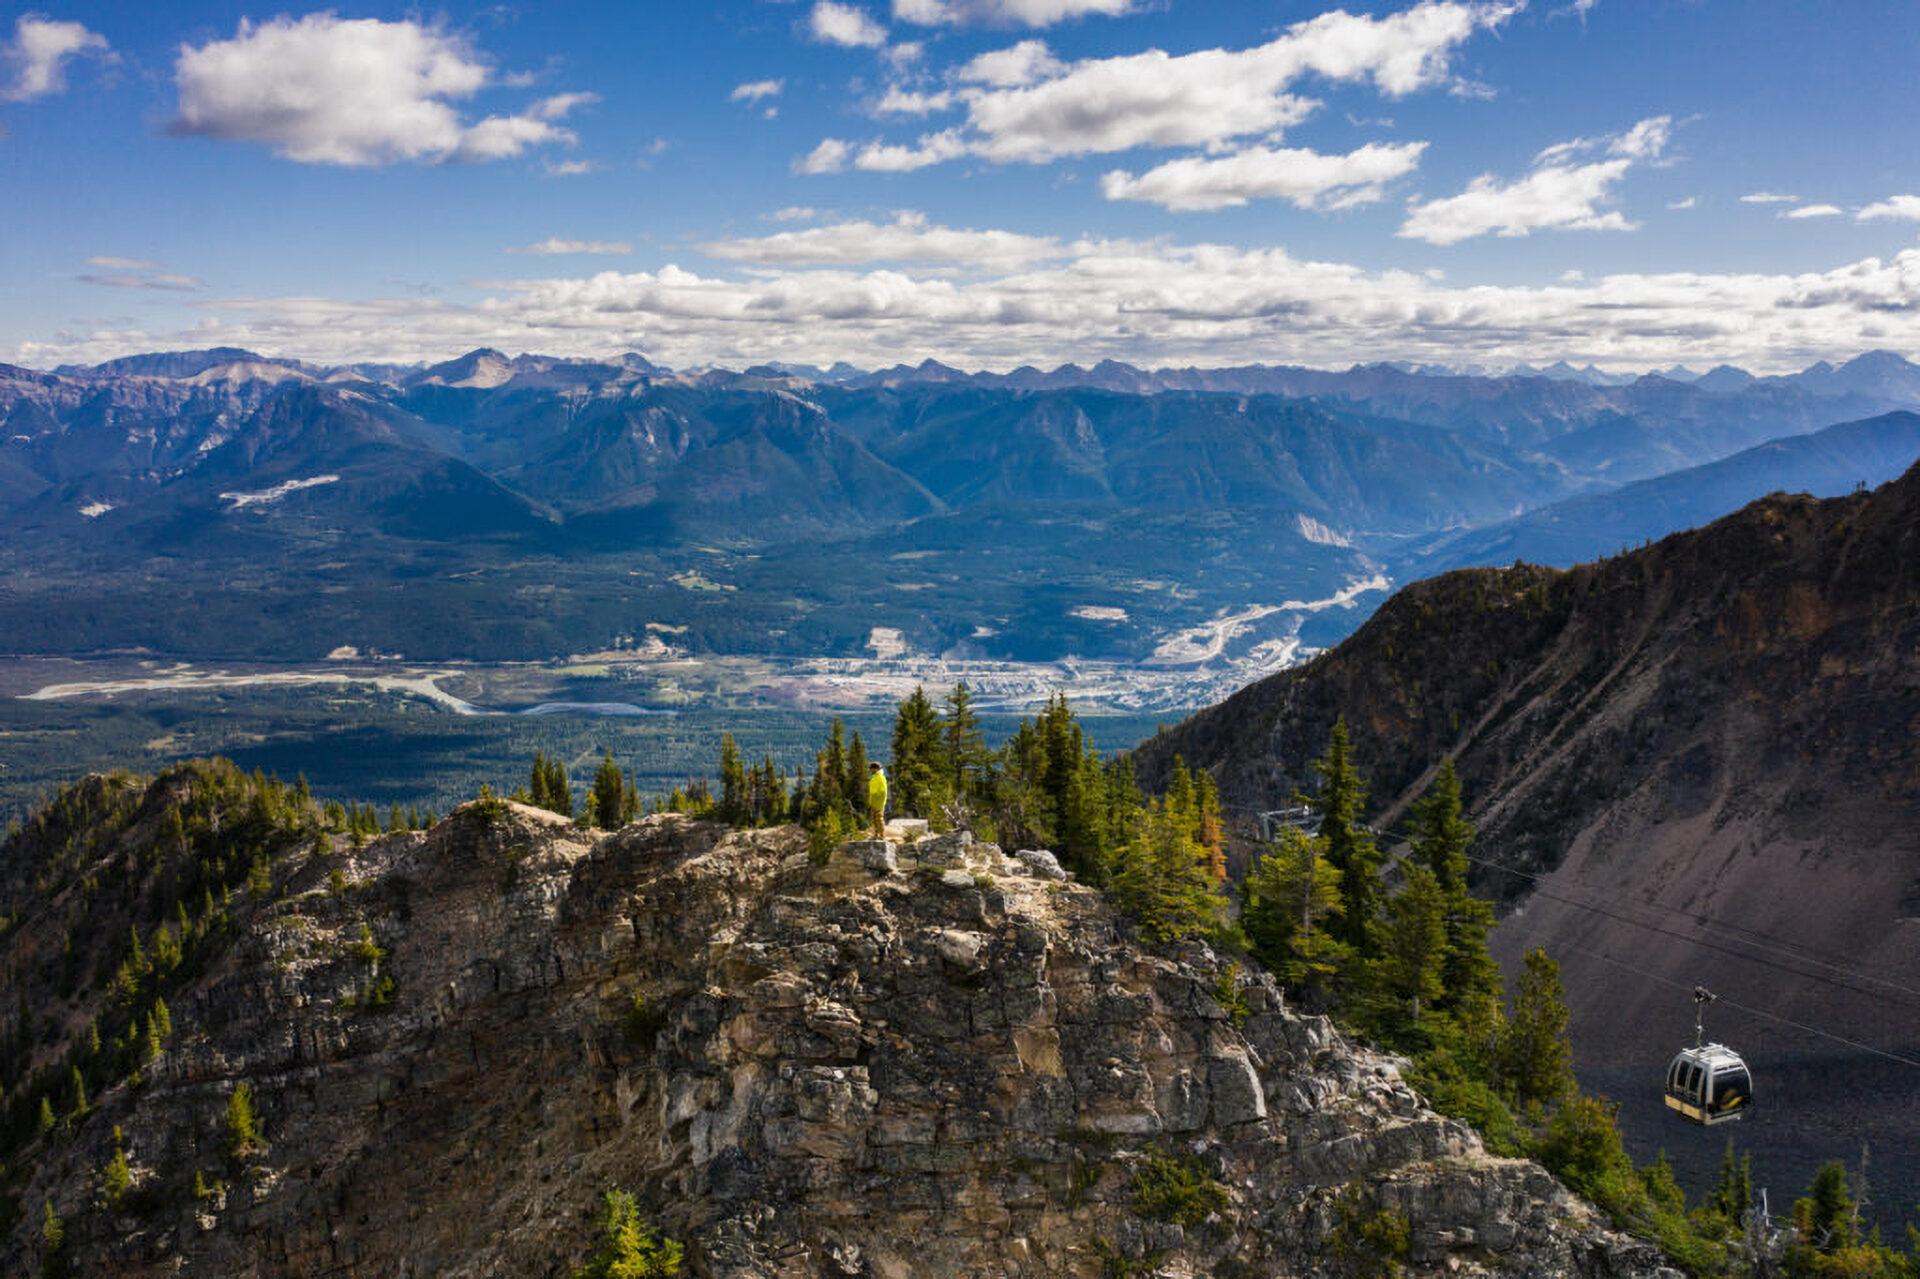 Kicking Horse Mountain Resort, overlooking the Rocky Mountains. Photo by Kootenay Rockies Tourism/Mitch Winton.